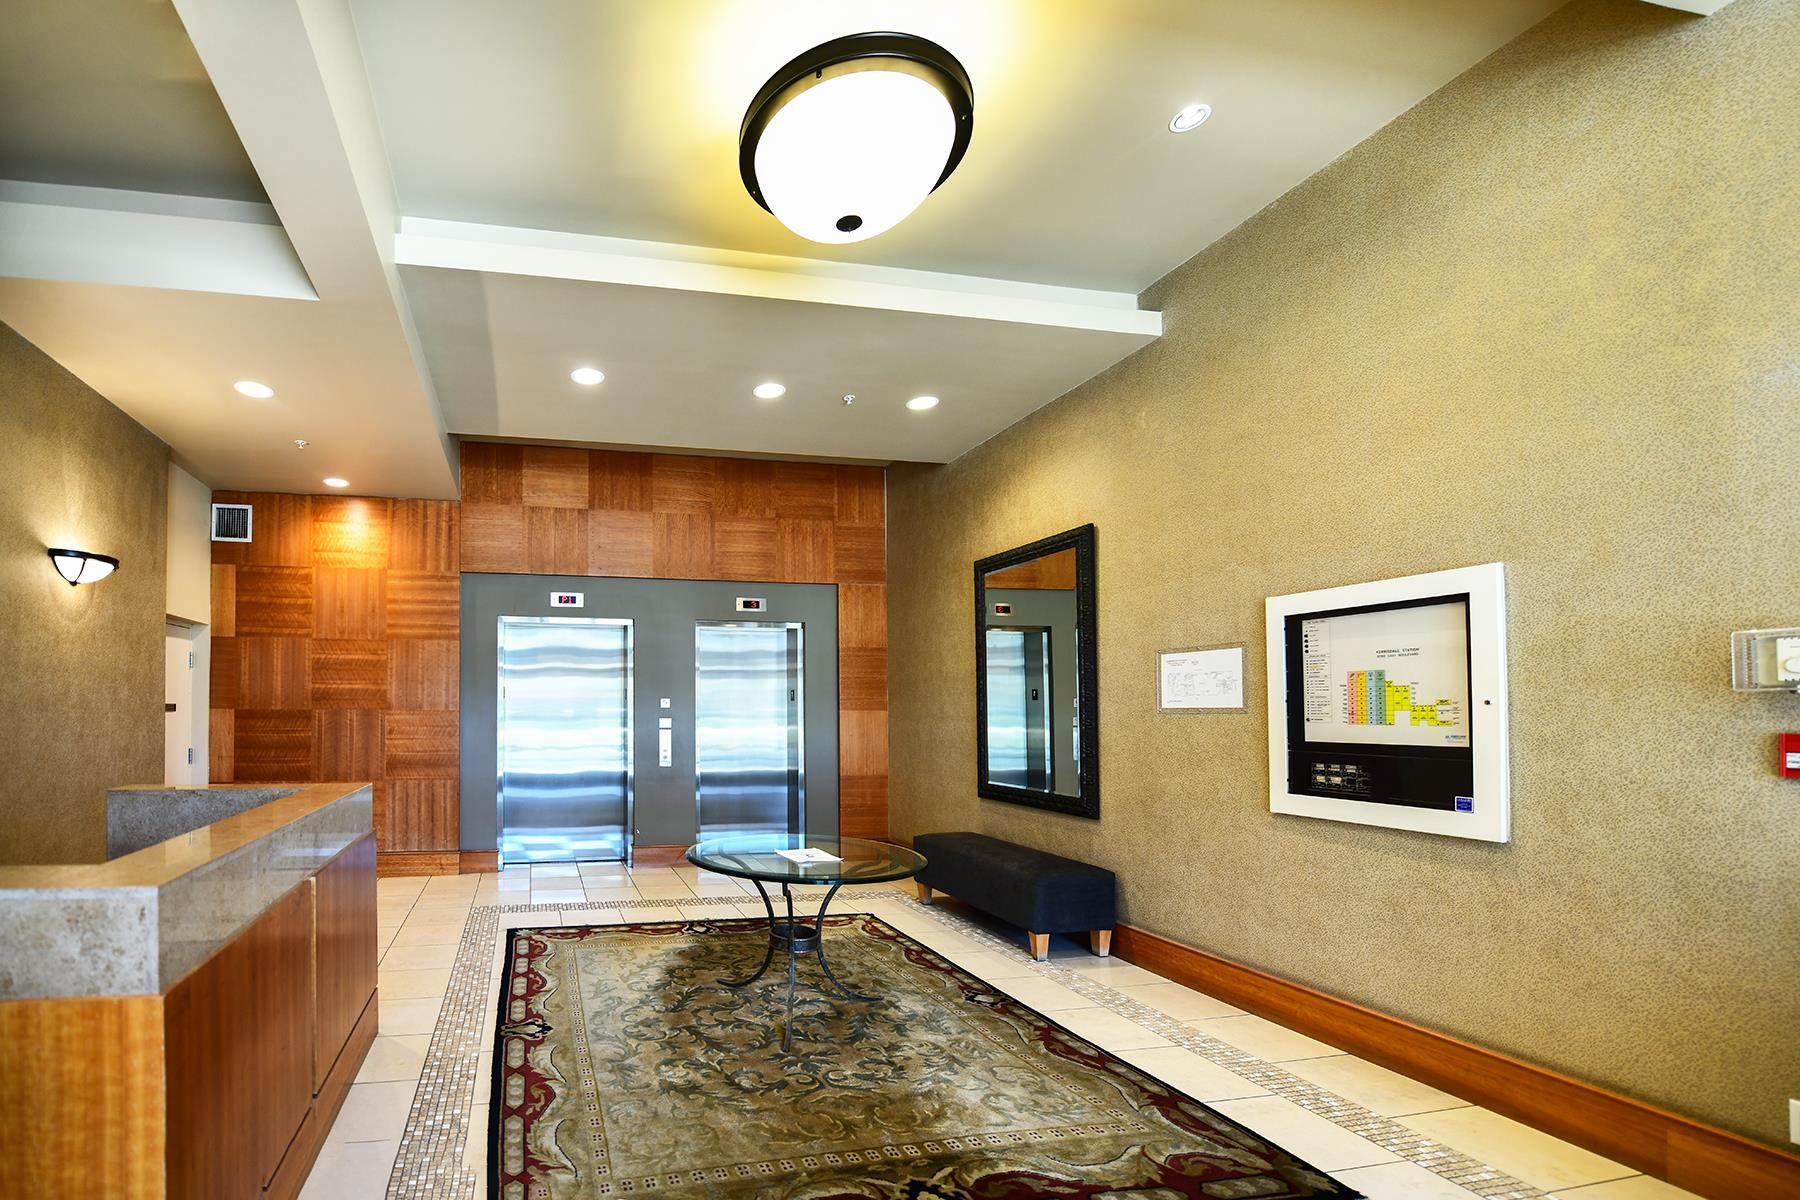 204 5790 EAST BOULEVARD - Kerrisdale Apartment/Condo for sale, 3 Bedrooms (R2604138) - #24